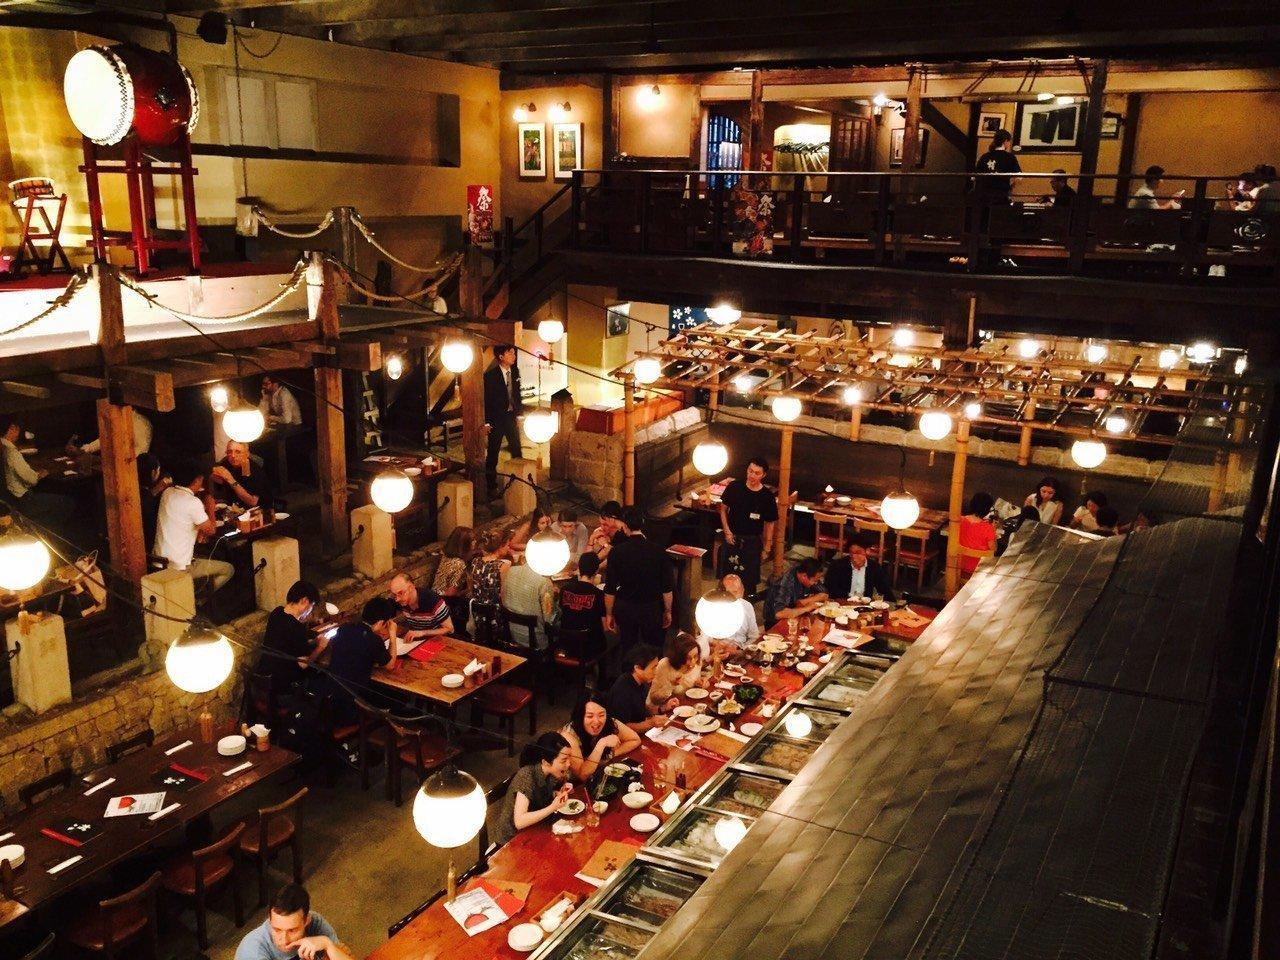 12 years on: Gonpachi aka the Kill Bill restaurant today